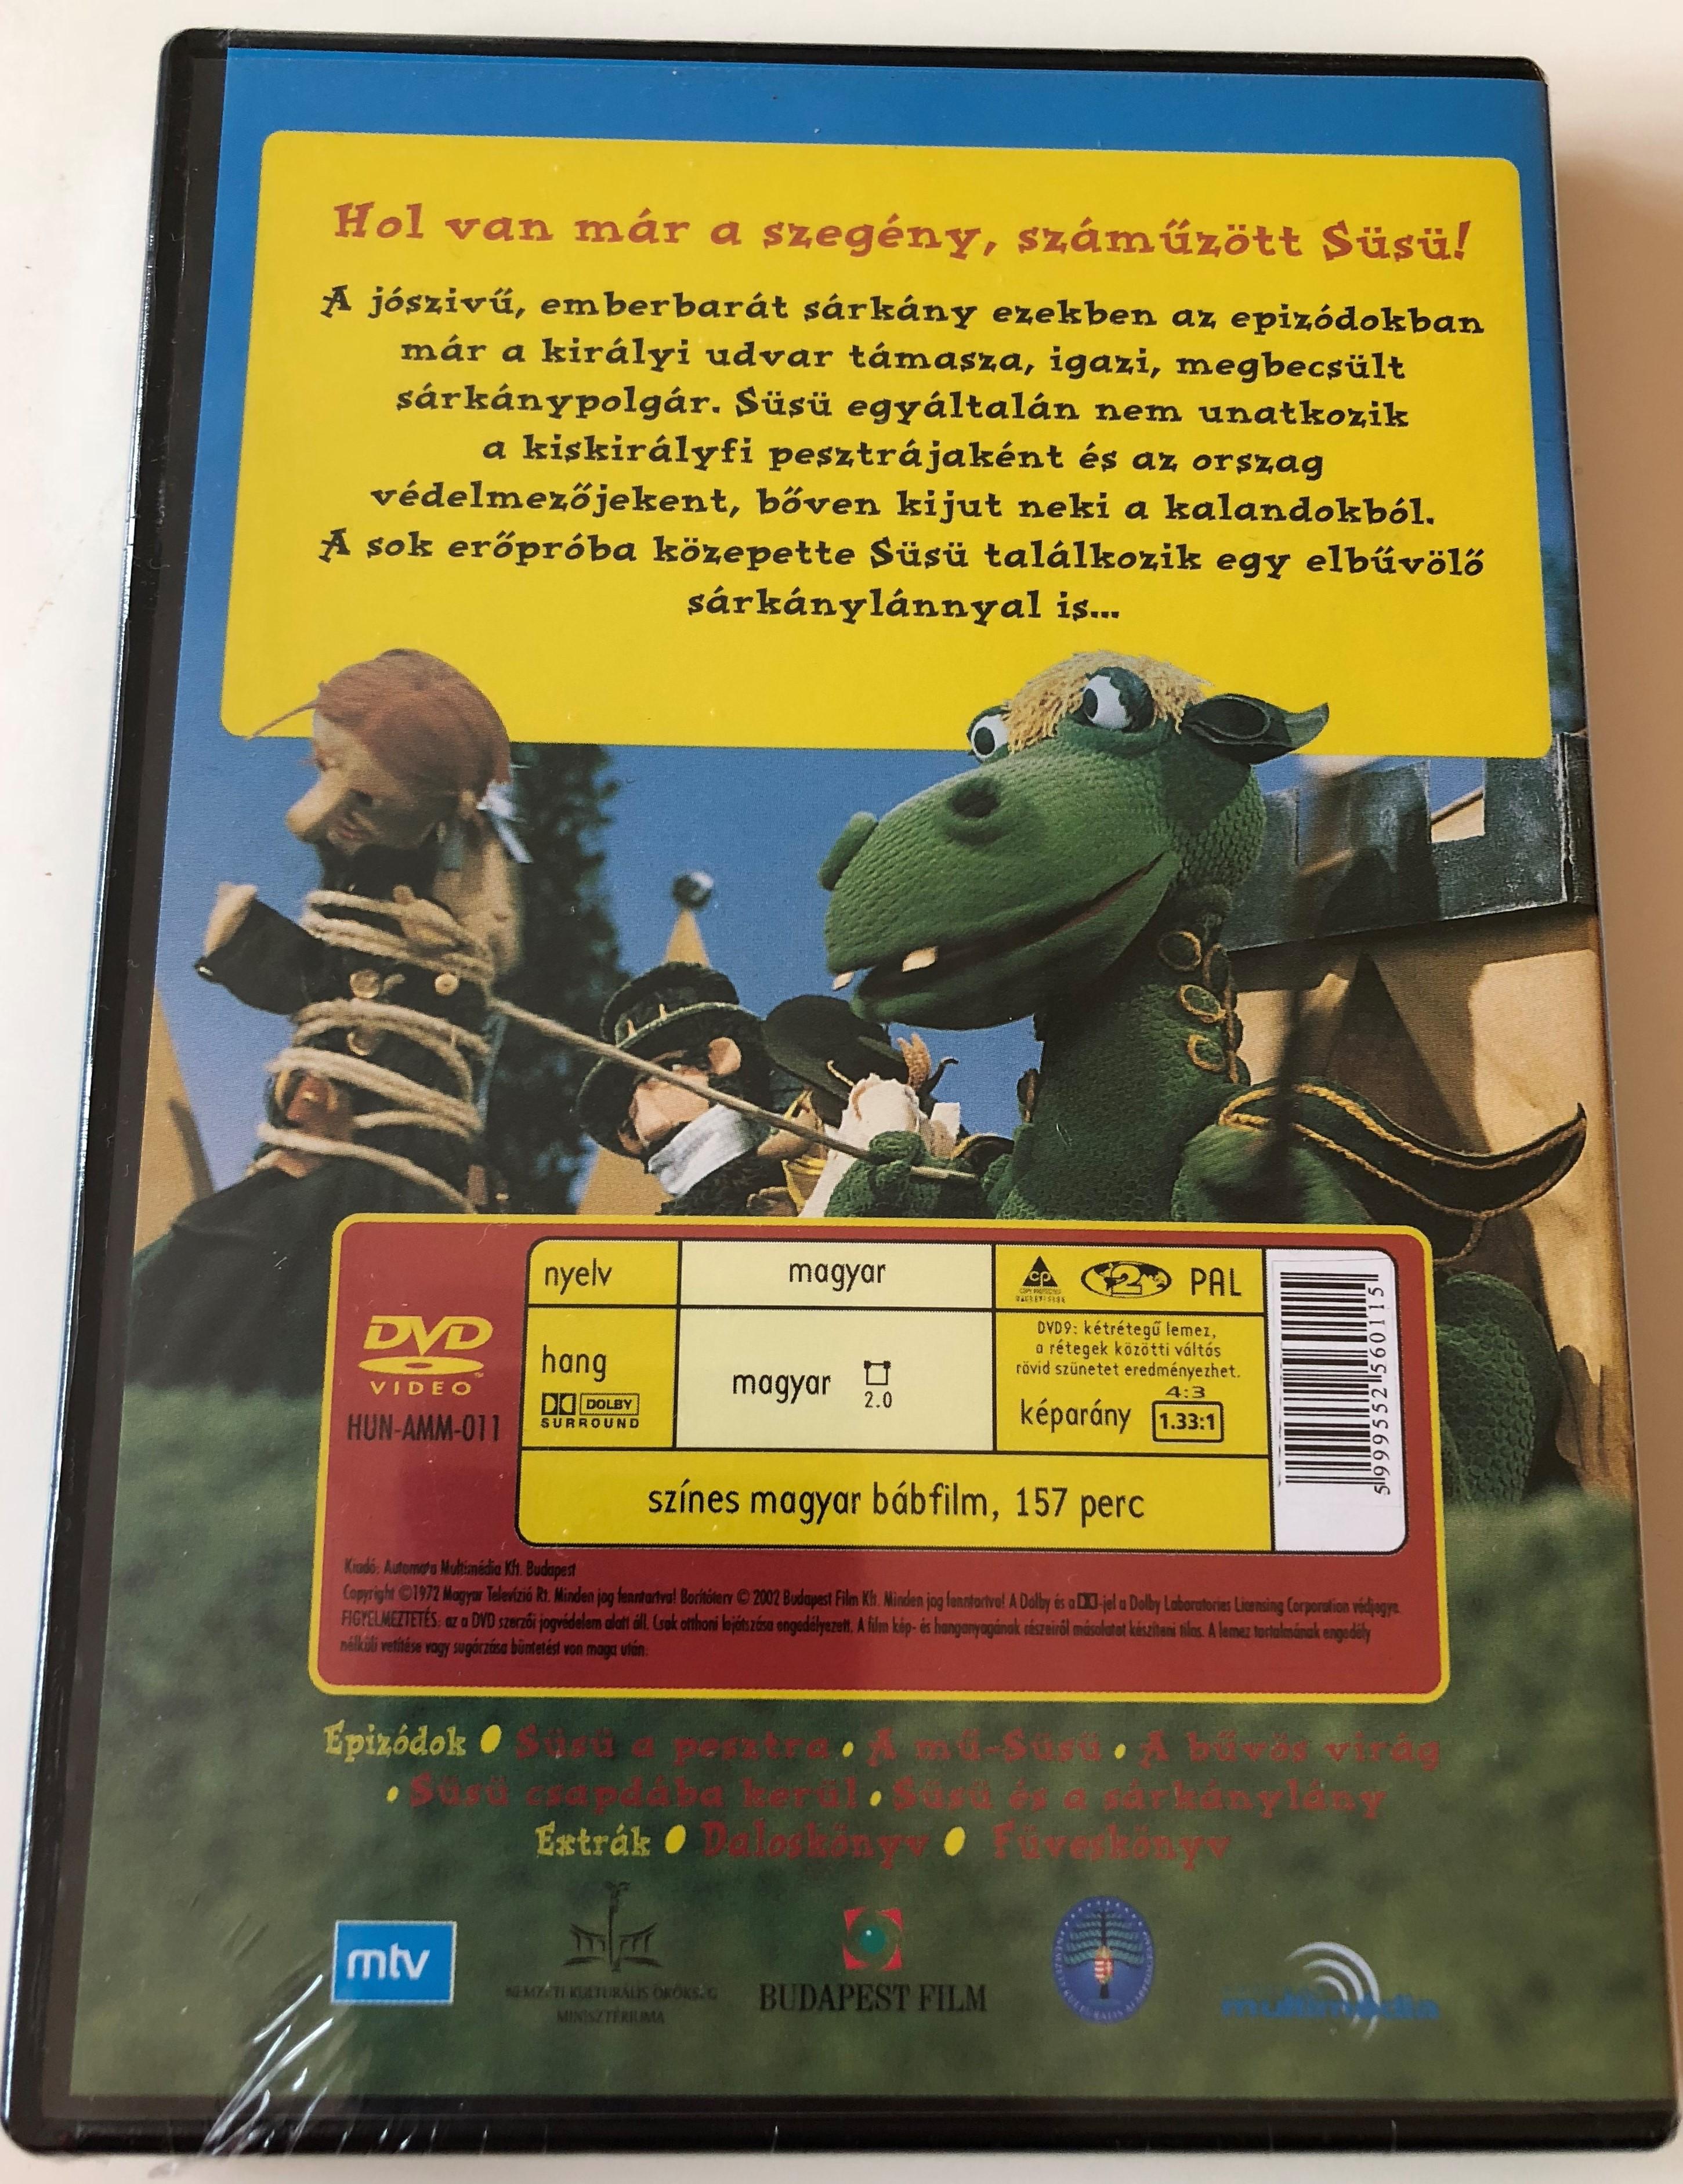 s-s-a-s-rk-ny-2.-dvd-1972-susu-the-dragon-2-directed-by-szab-attila-starring-bodrogi-gyula-sztankay-istv-n-scenario-csuk-s-istv-n-mtv-meset-r-sorozat-2-.jpg